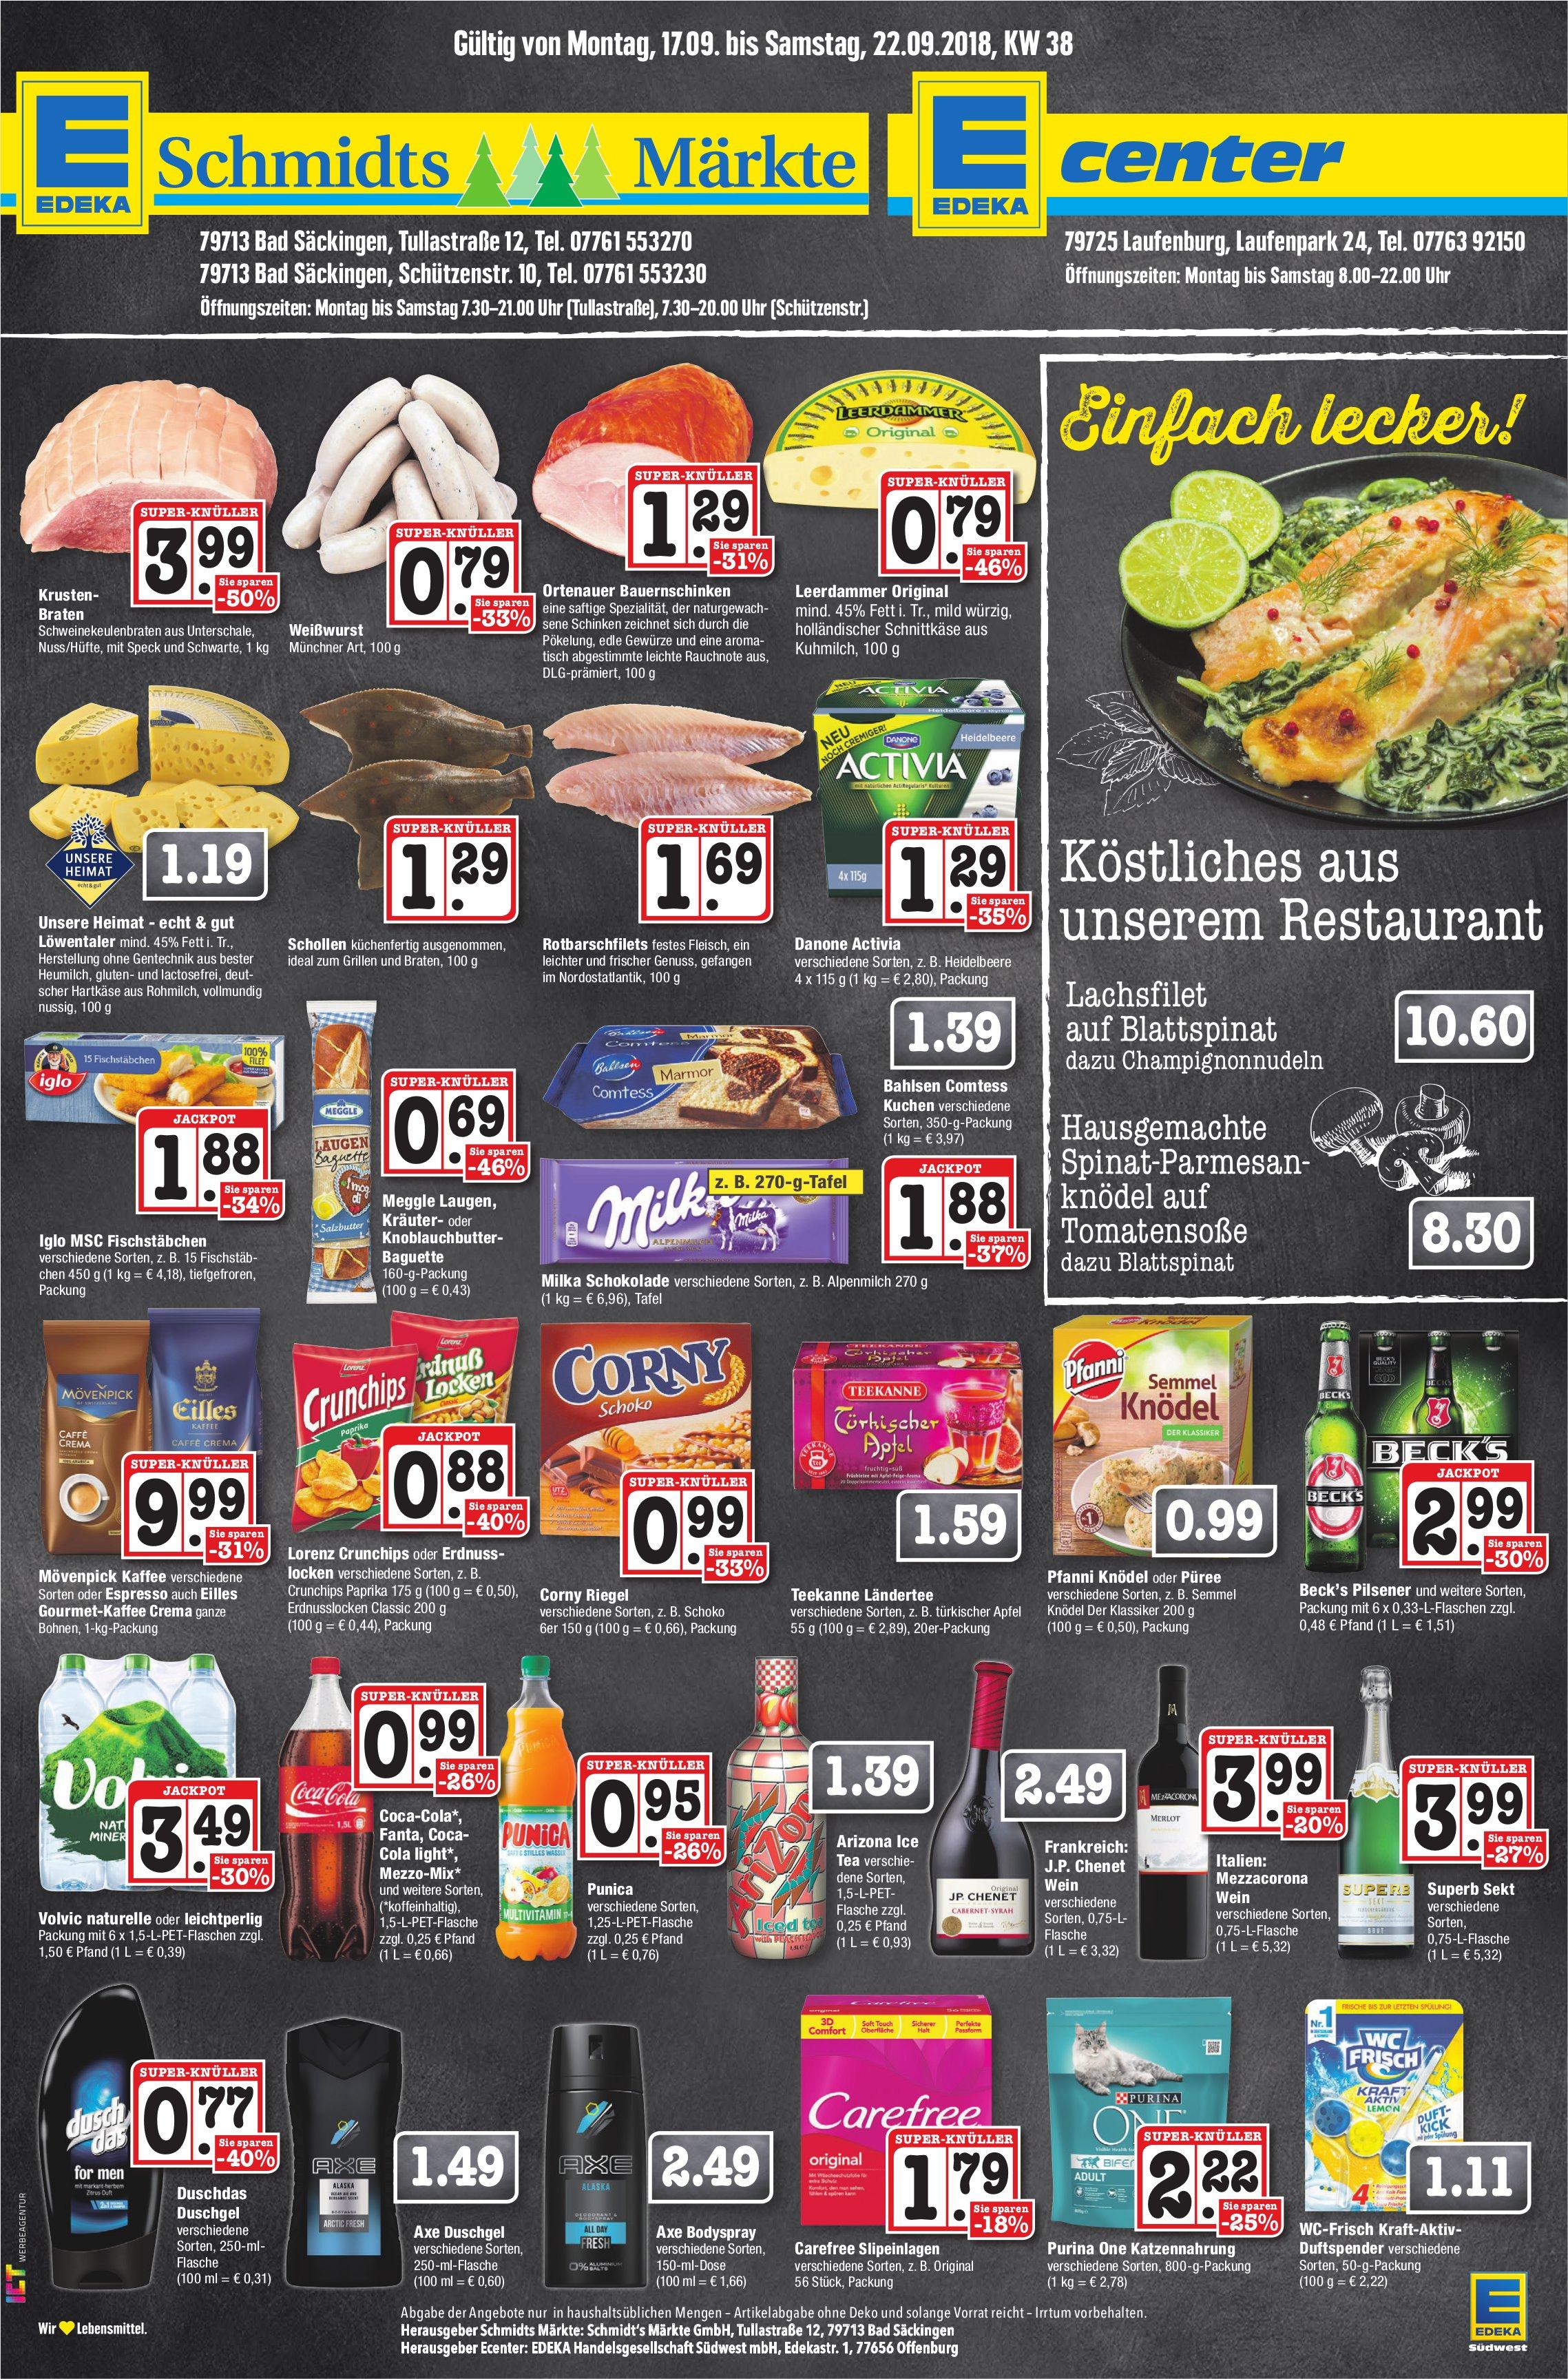 EDEKA Schmidts Märkte - Angebote vom 17. bis 22. September